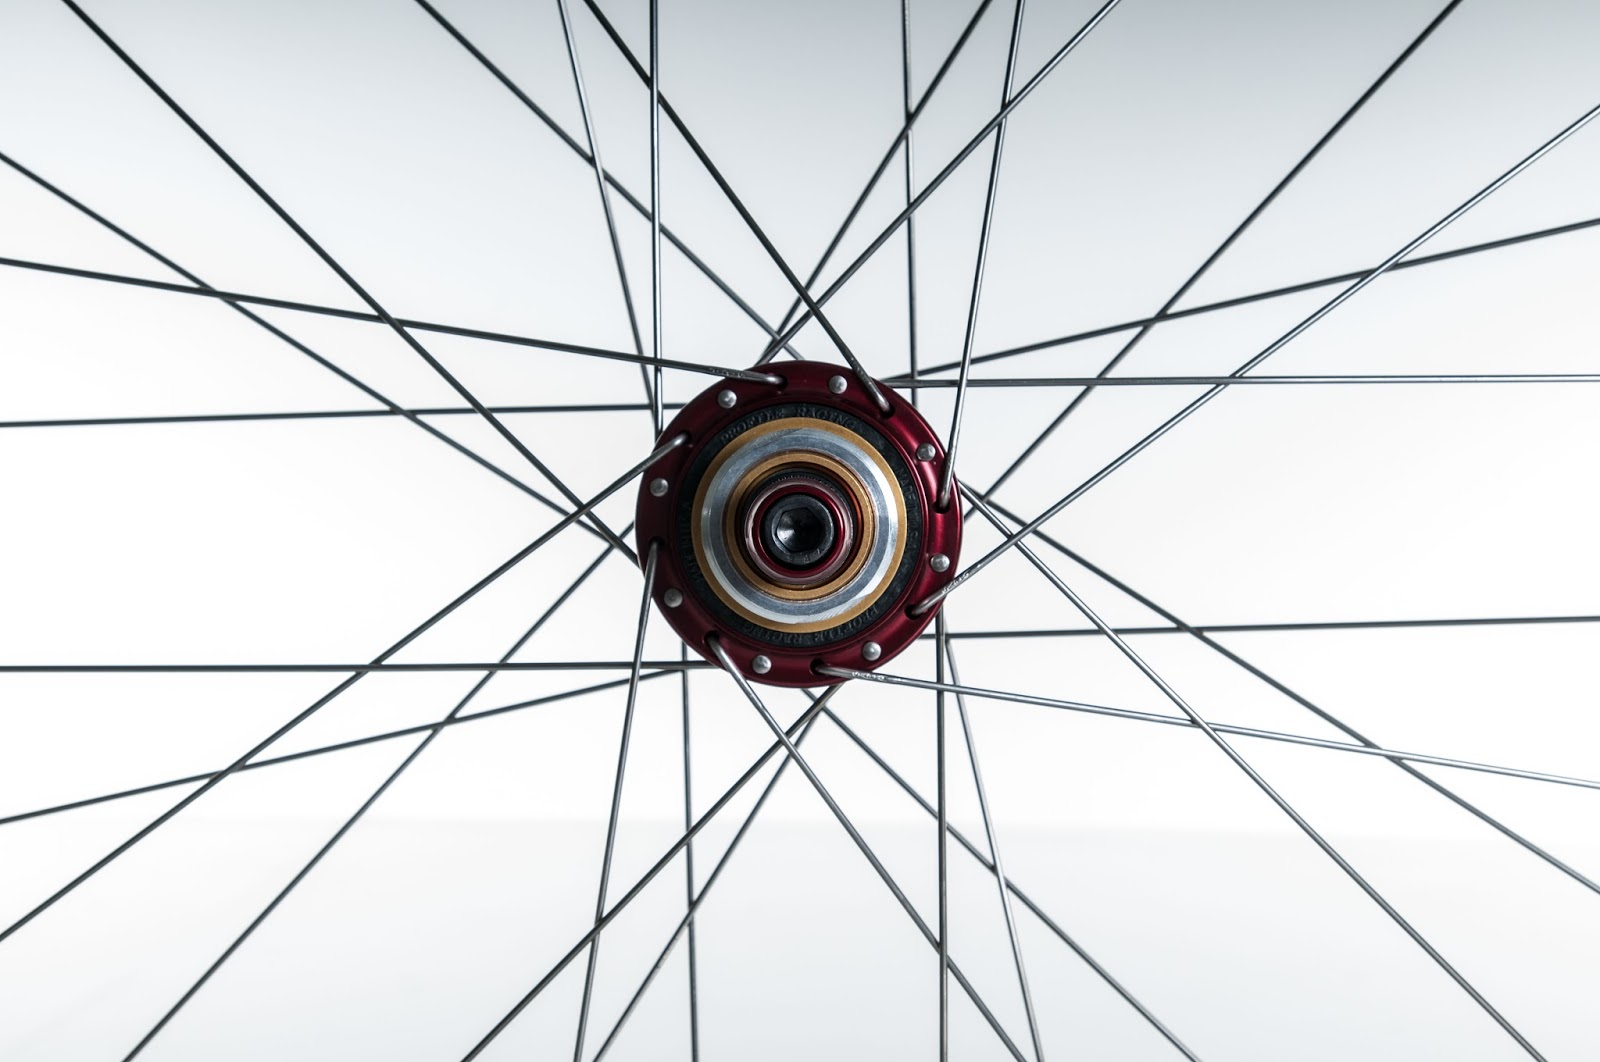 MTB: 26+ Velocity Dually Rims with Profile Racing Hubs